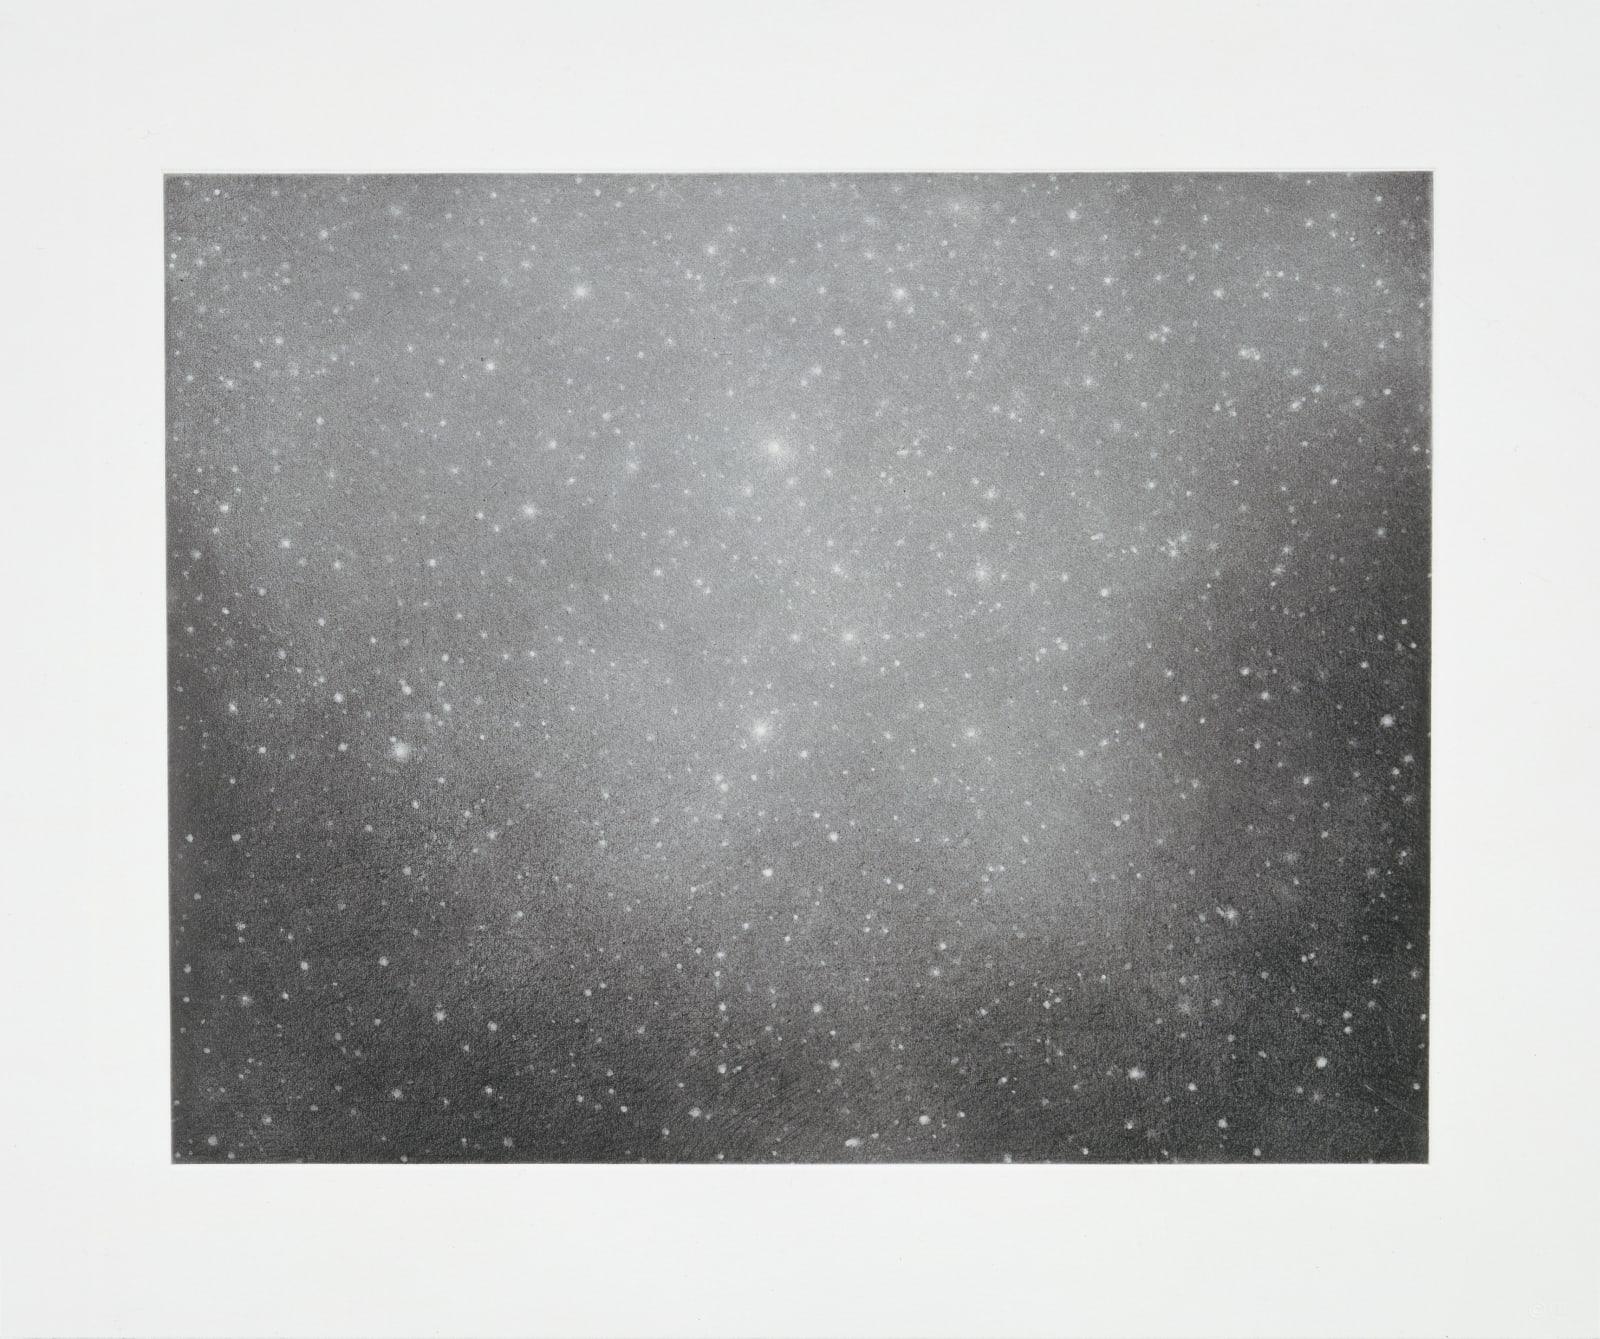 Vija Celmins Night Sky 3, 2002 single colour print with photogravure, aquatint & drypoint 50.17 x 60.33 cm19 3/4